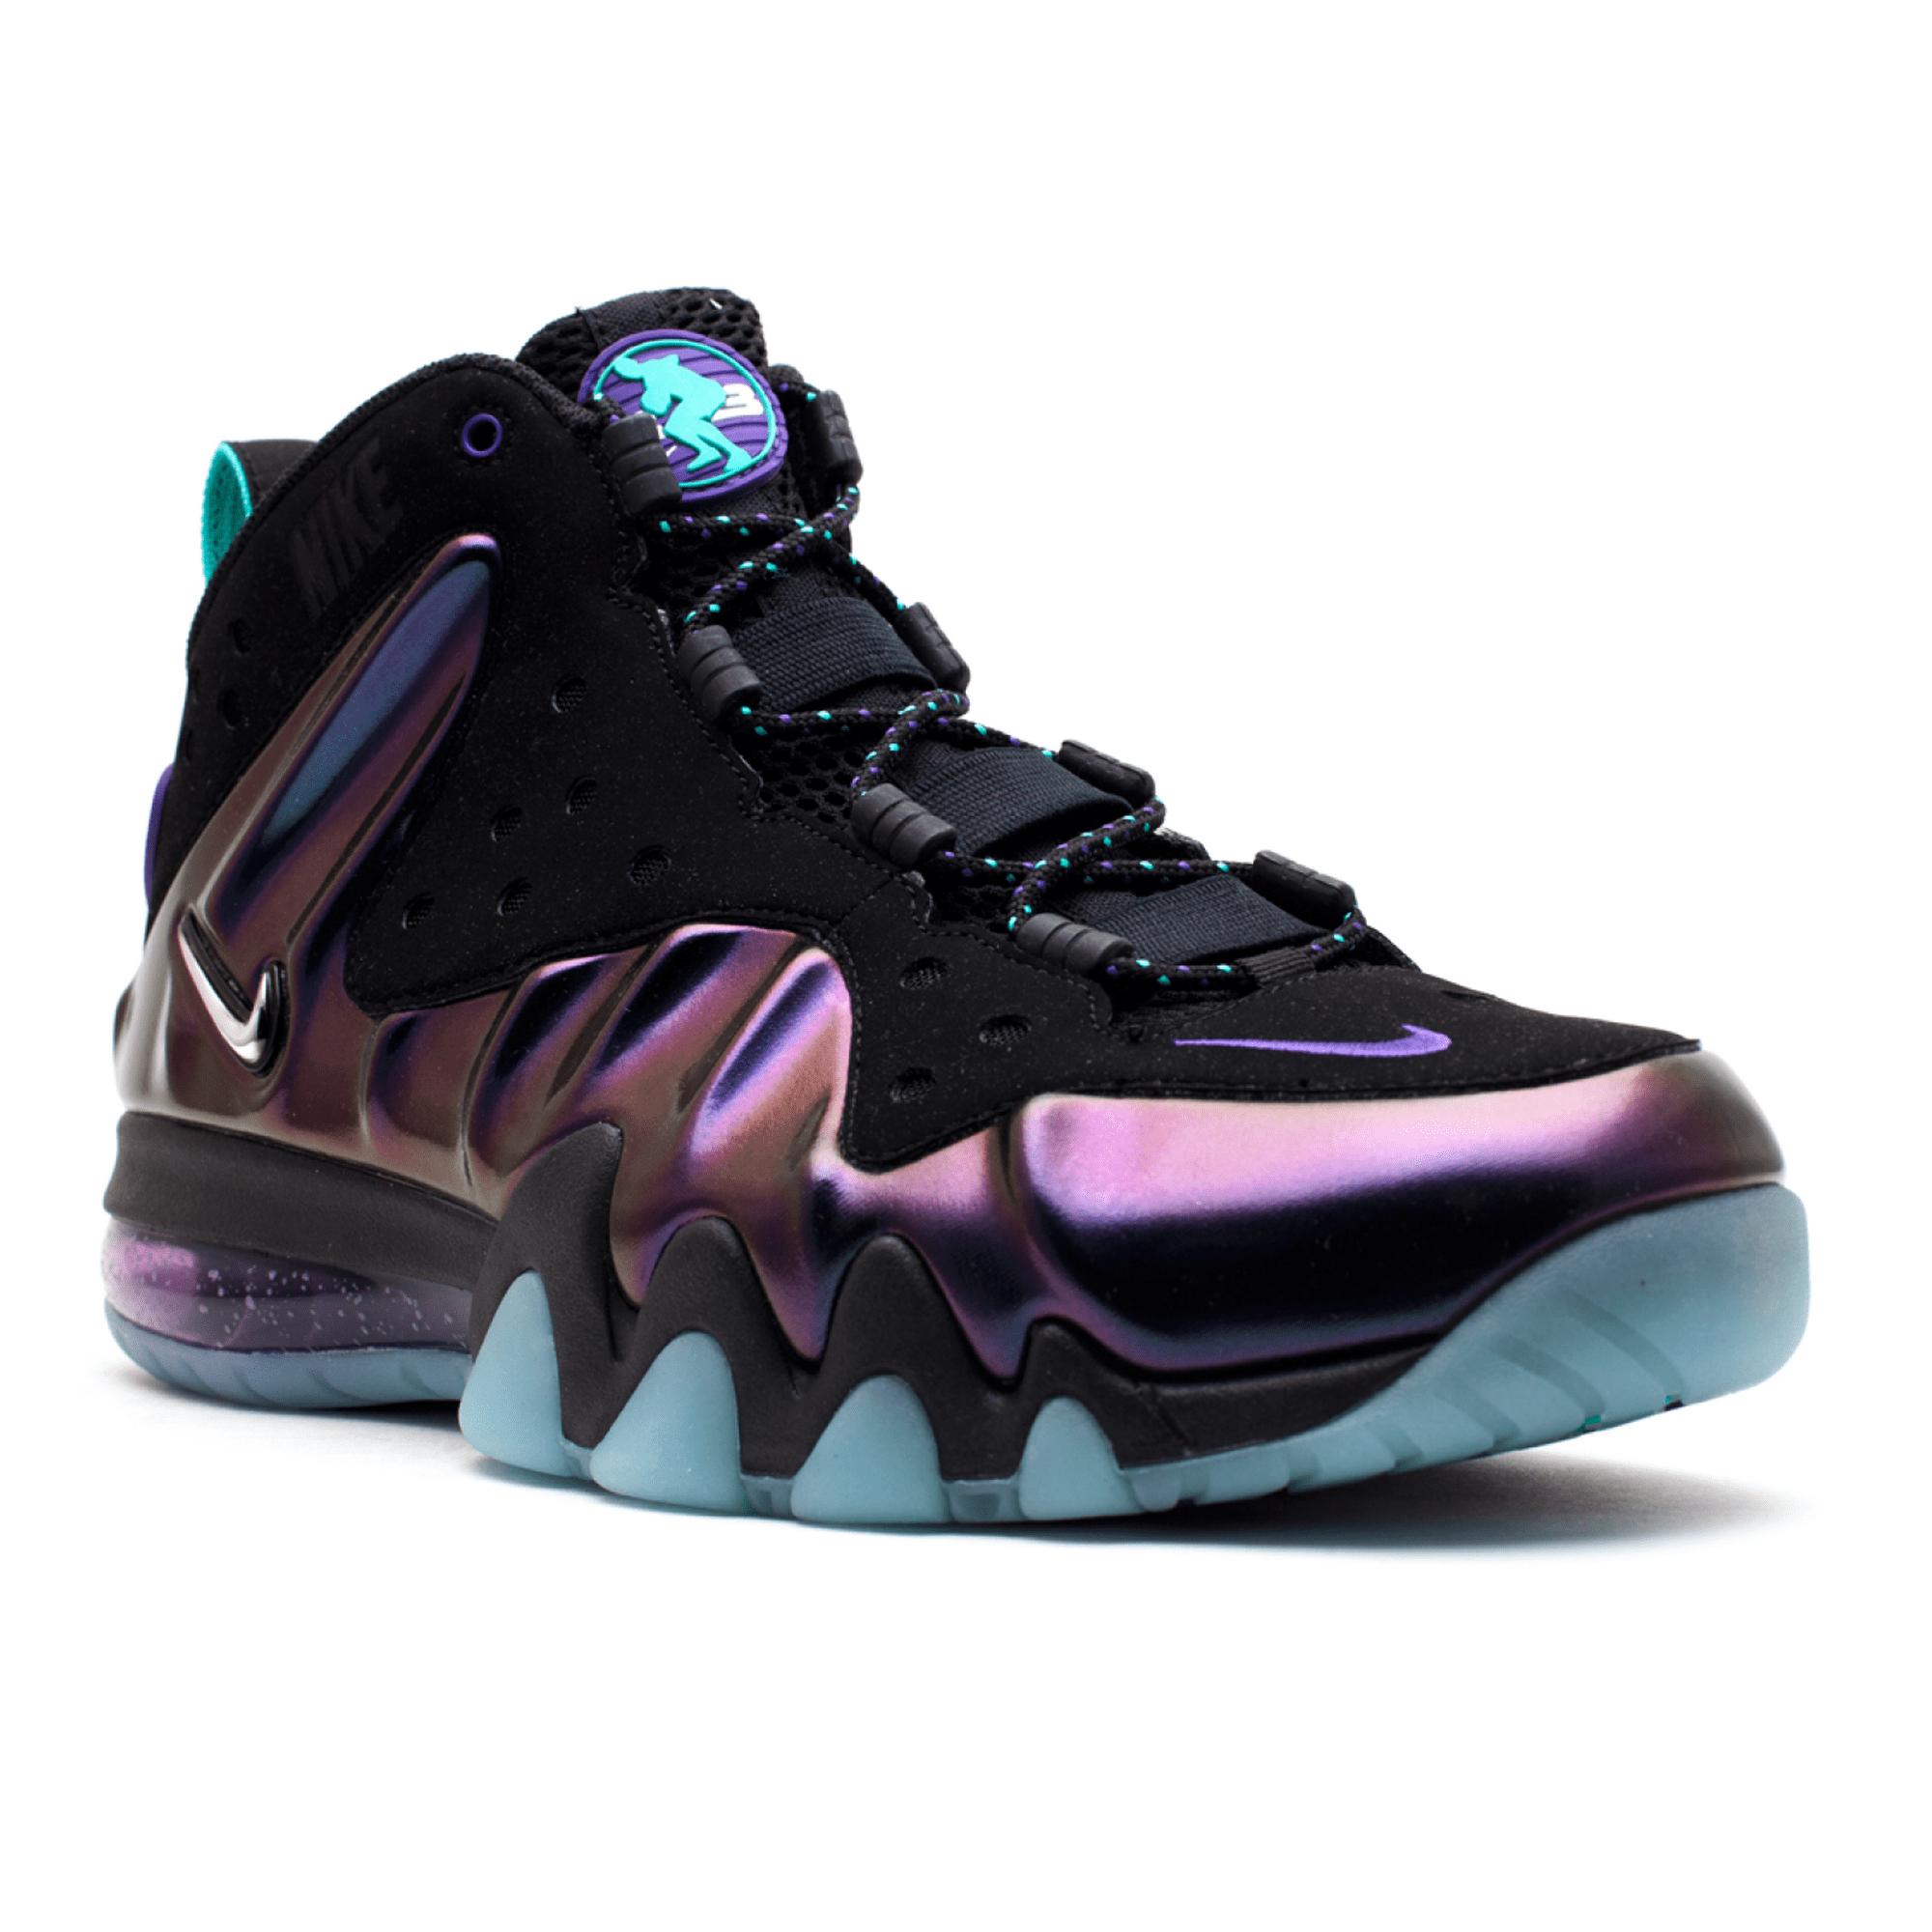 low priced 43f19 3476a Nike - Men - Nike Mens Barkley Posite Max Black Eggplant -555097-003 - Size  8   Walmart Canada